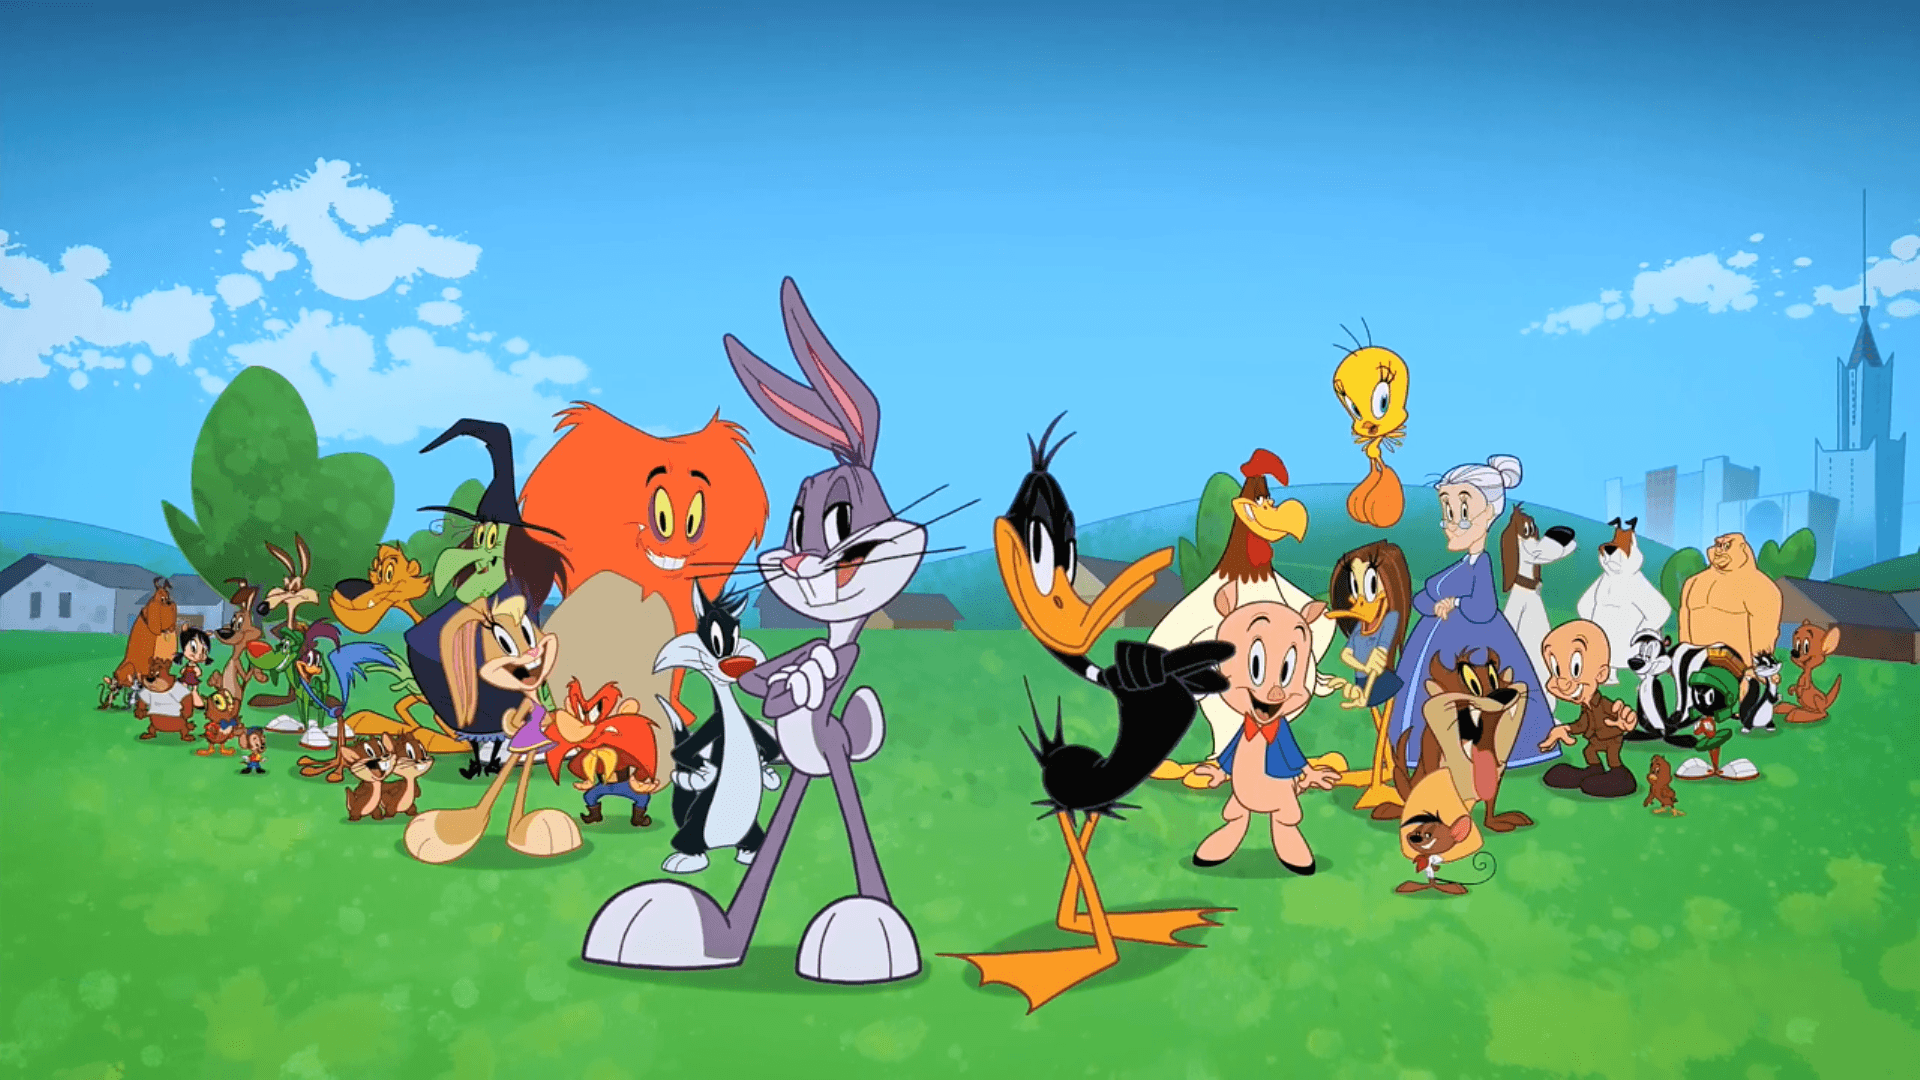 Looney Tunes Wallpapers - Top Free Looney Tunes ...